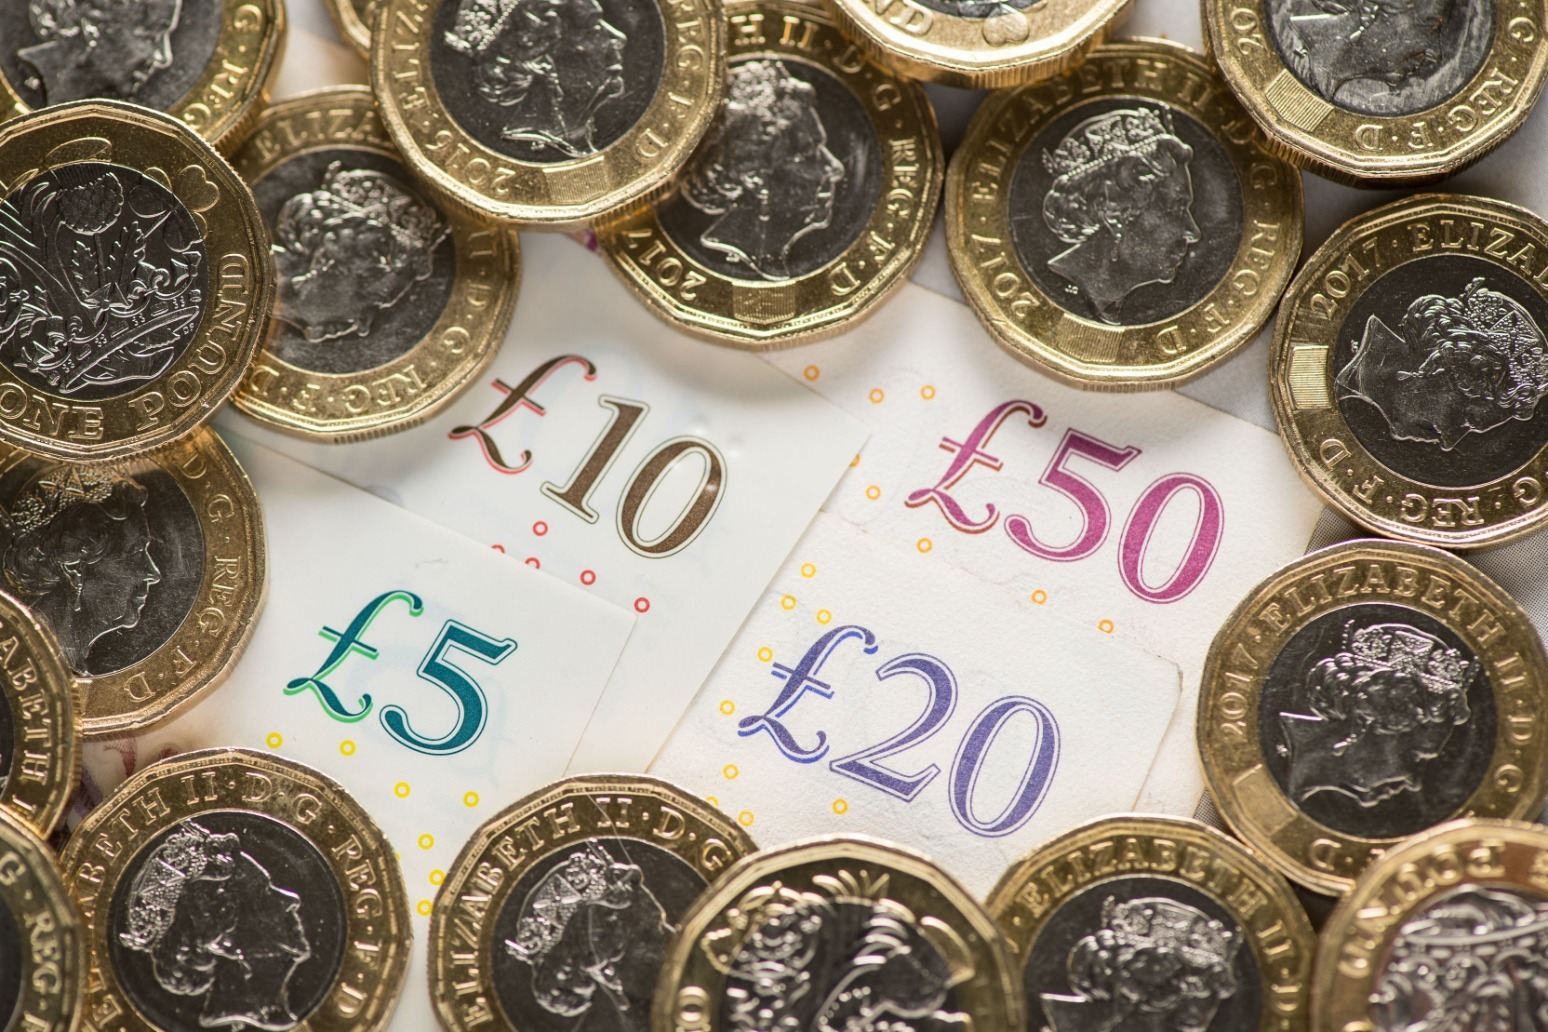 Tax gap was £35bn in 2019/20, says HMRC